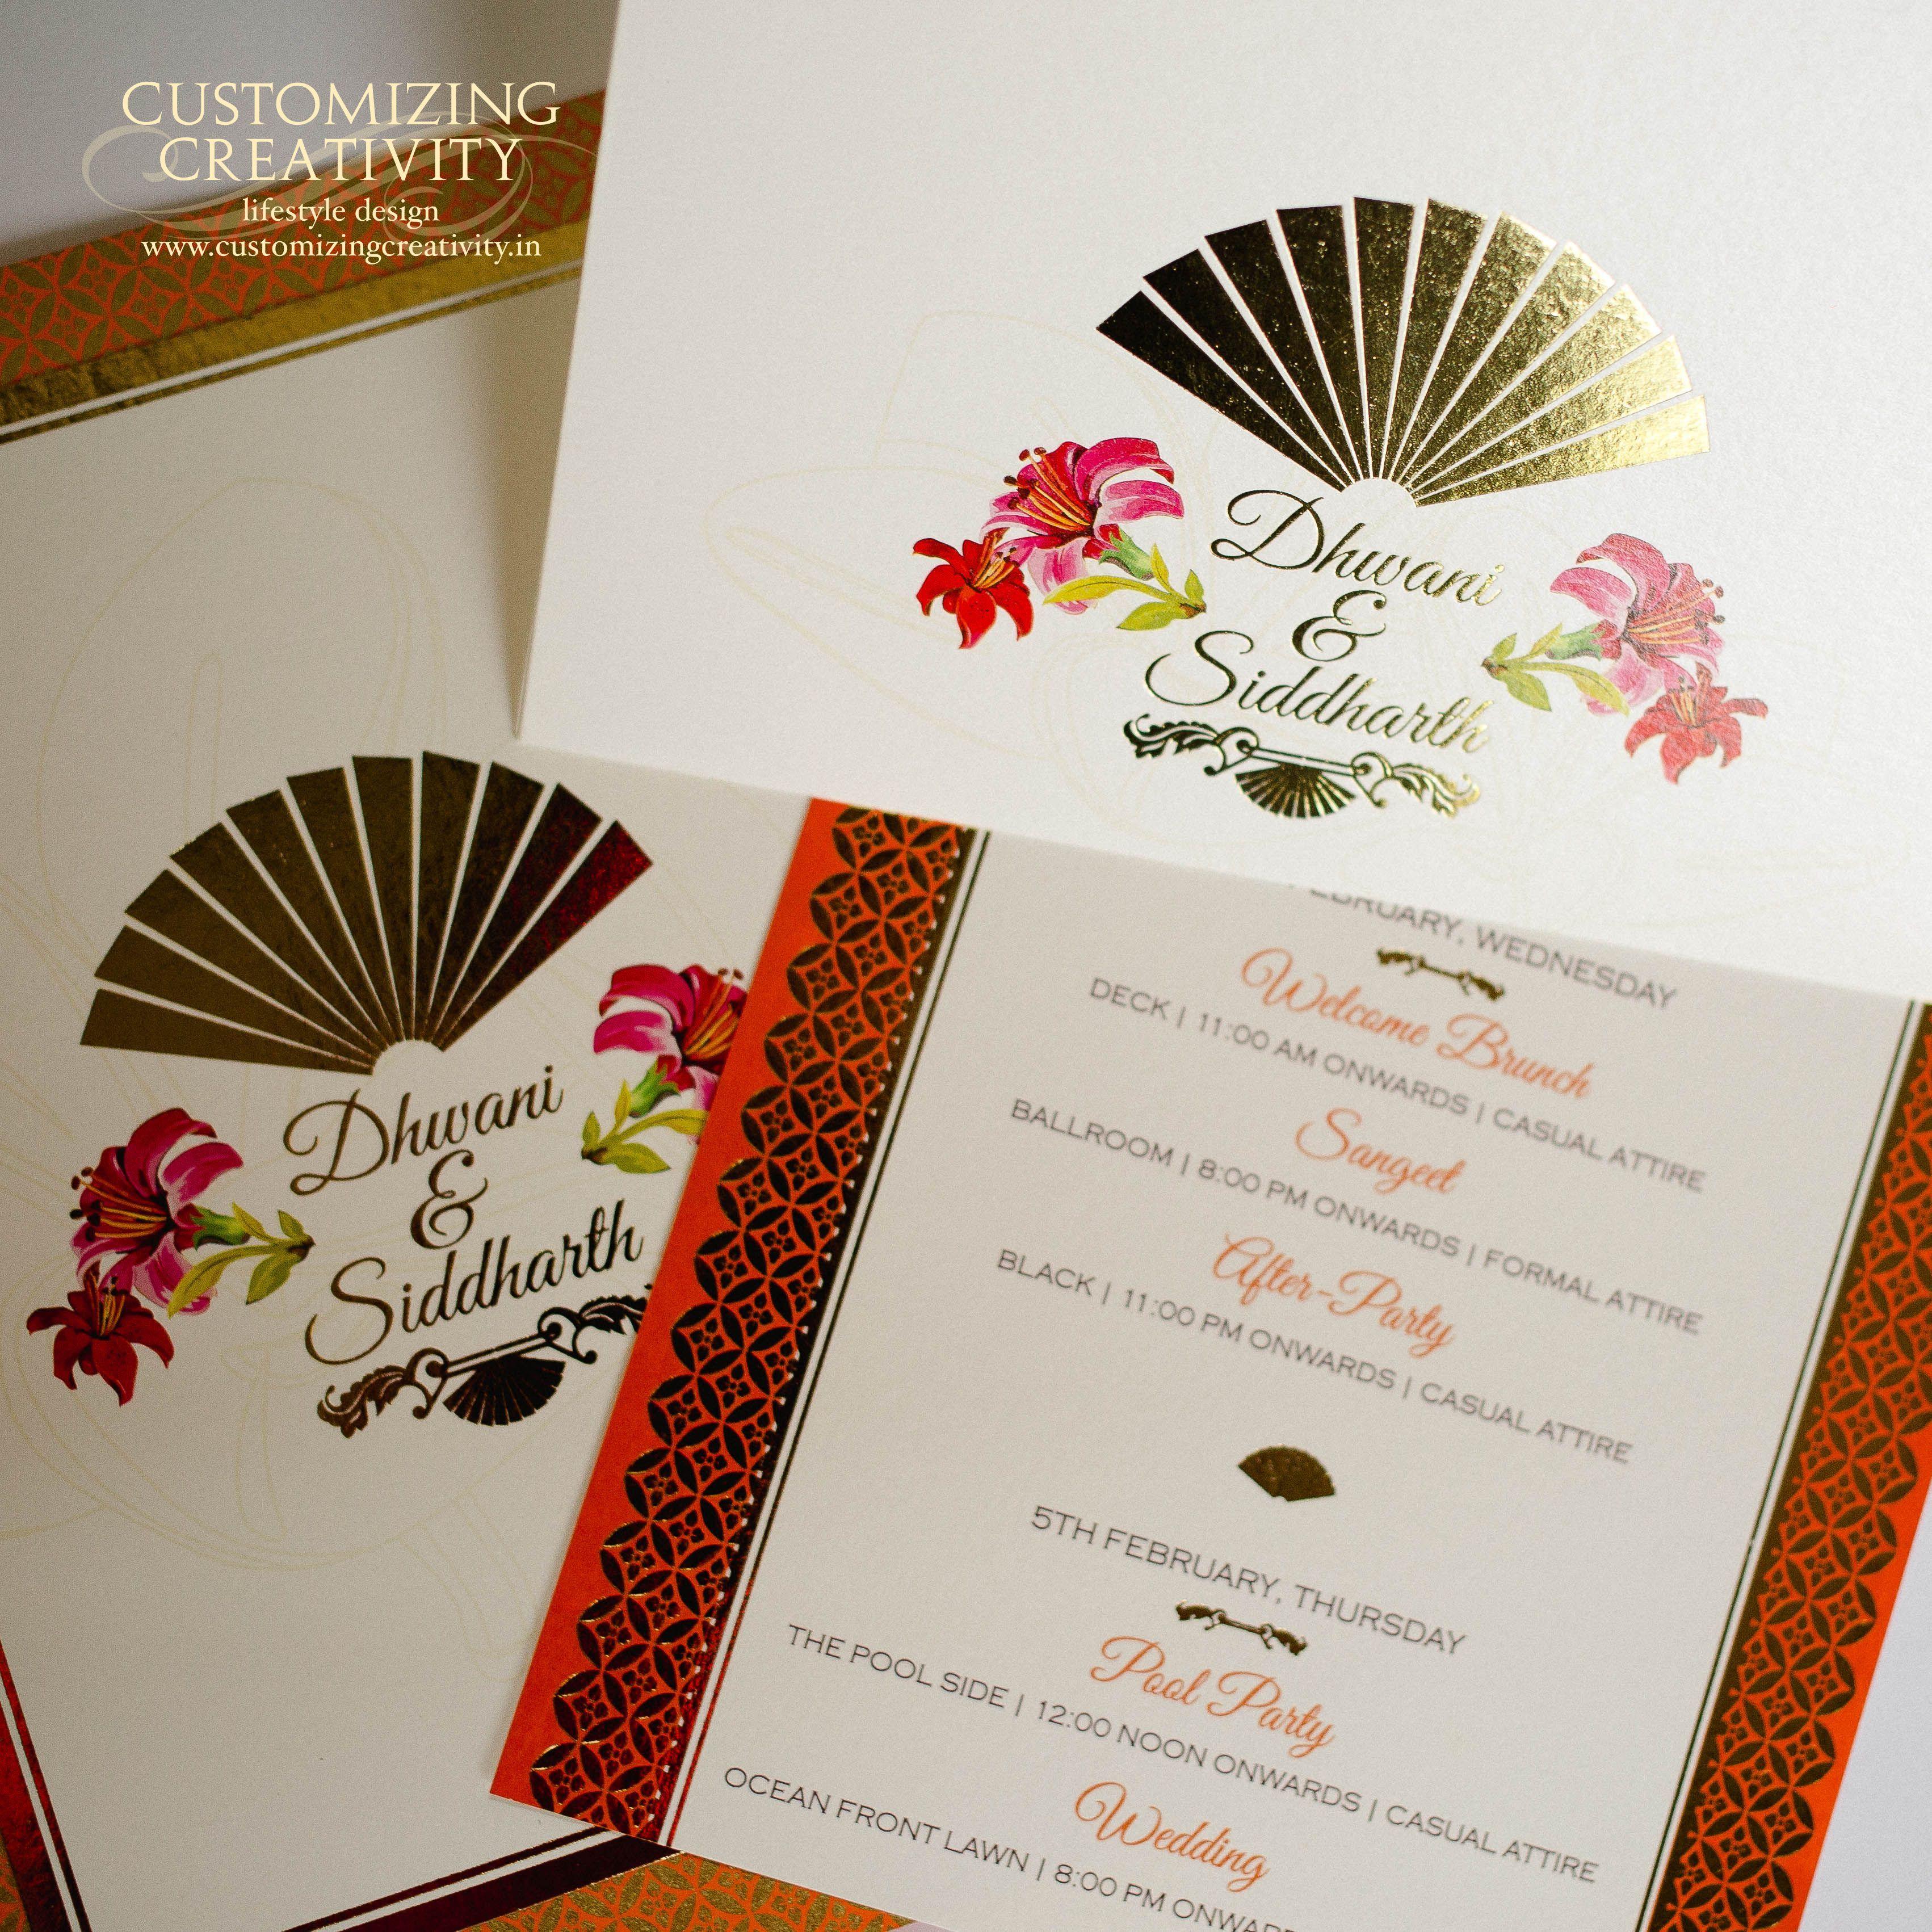 indian wedding hindu invitations%0A Wedding Invitations  Cards  Invitations  Invites  Wedding Stationery   Customized invitations  Custom made Cards  Custom Invites  Stationery   Designer cards